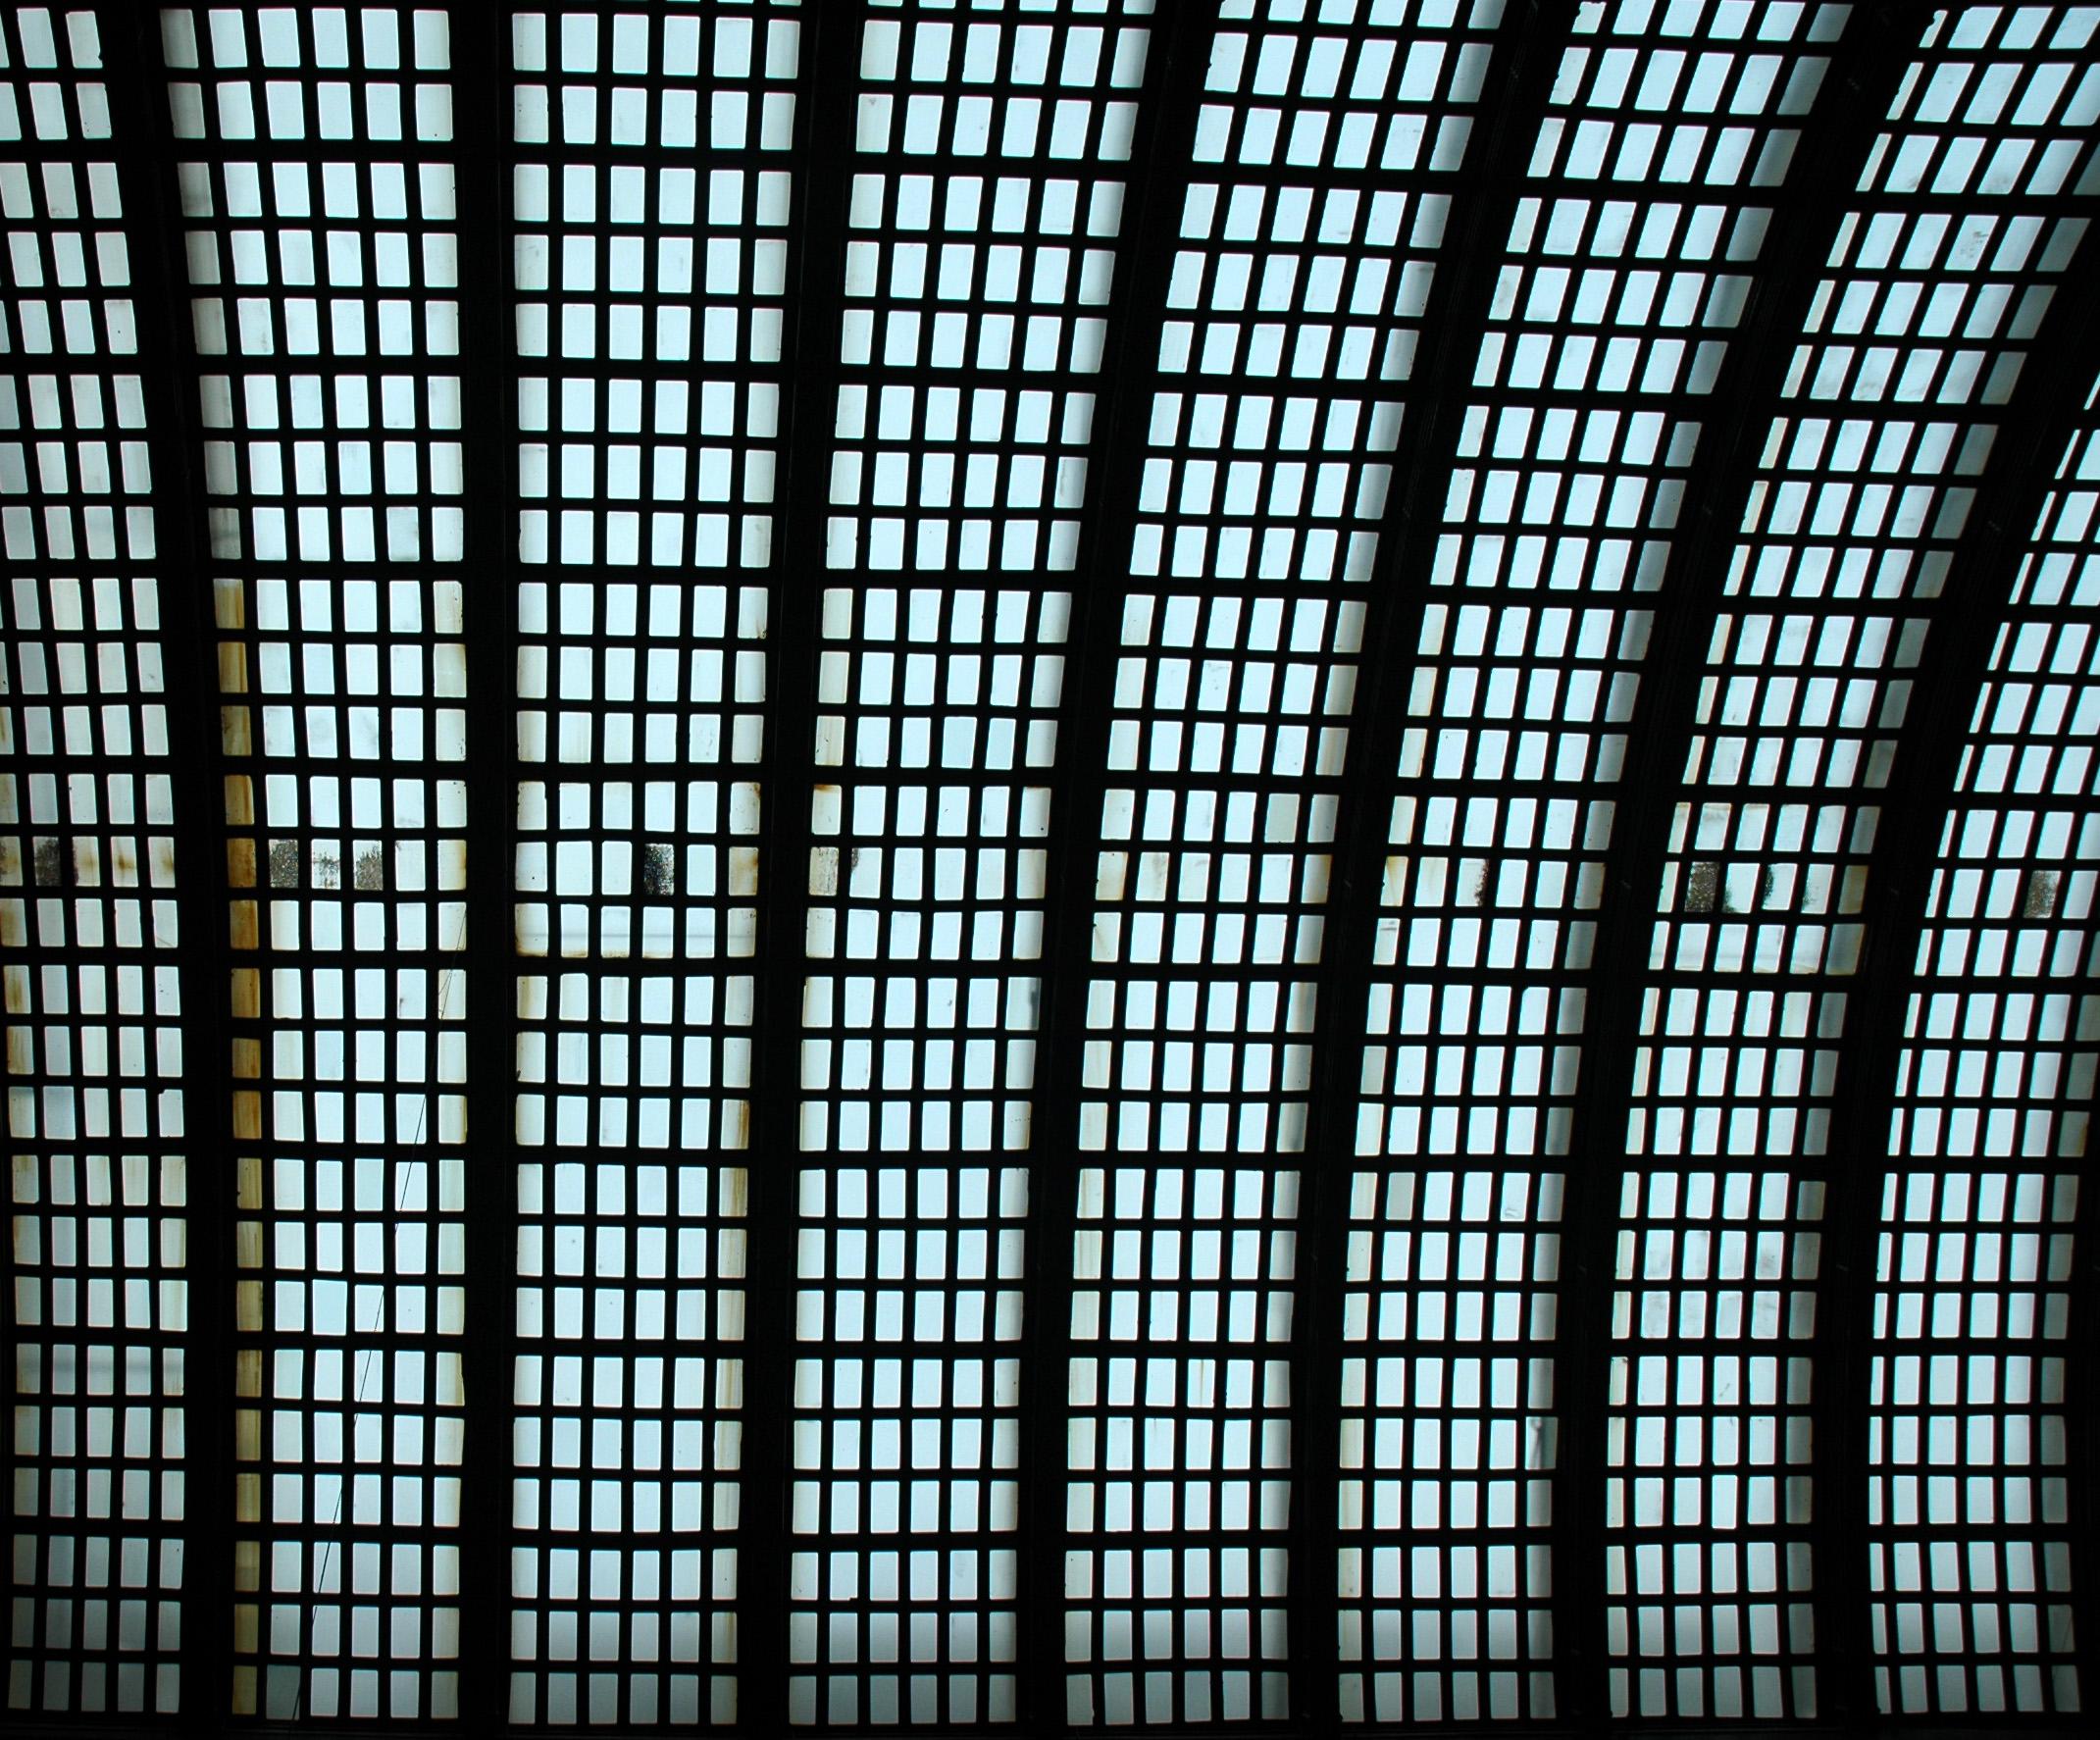 Union Station Ceiling Window